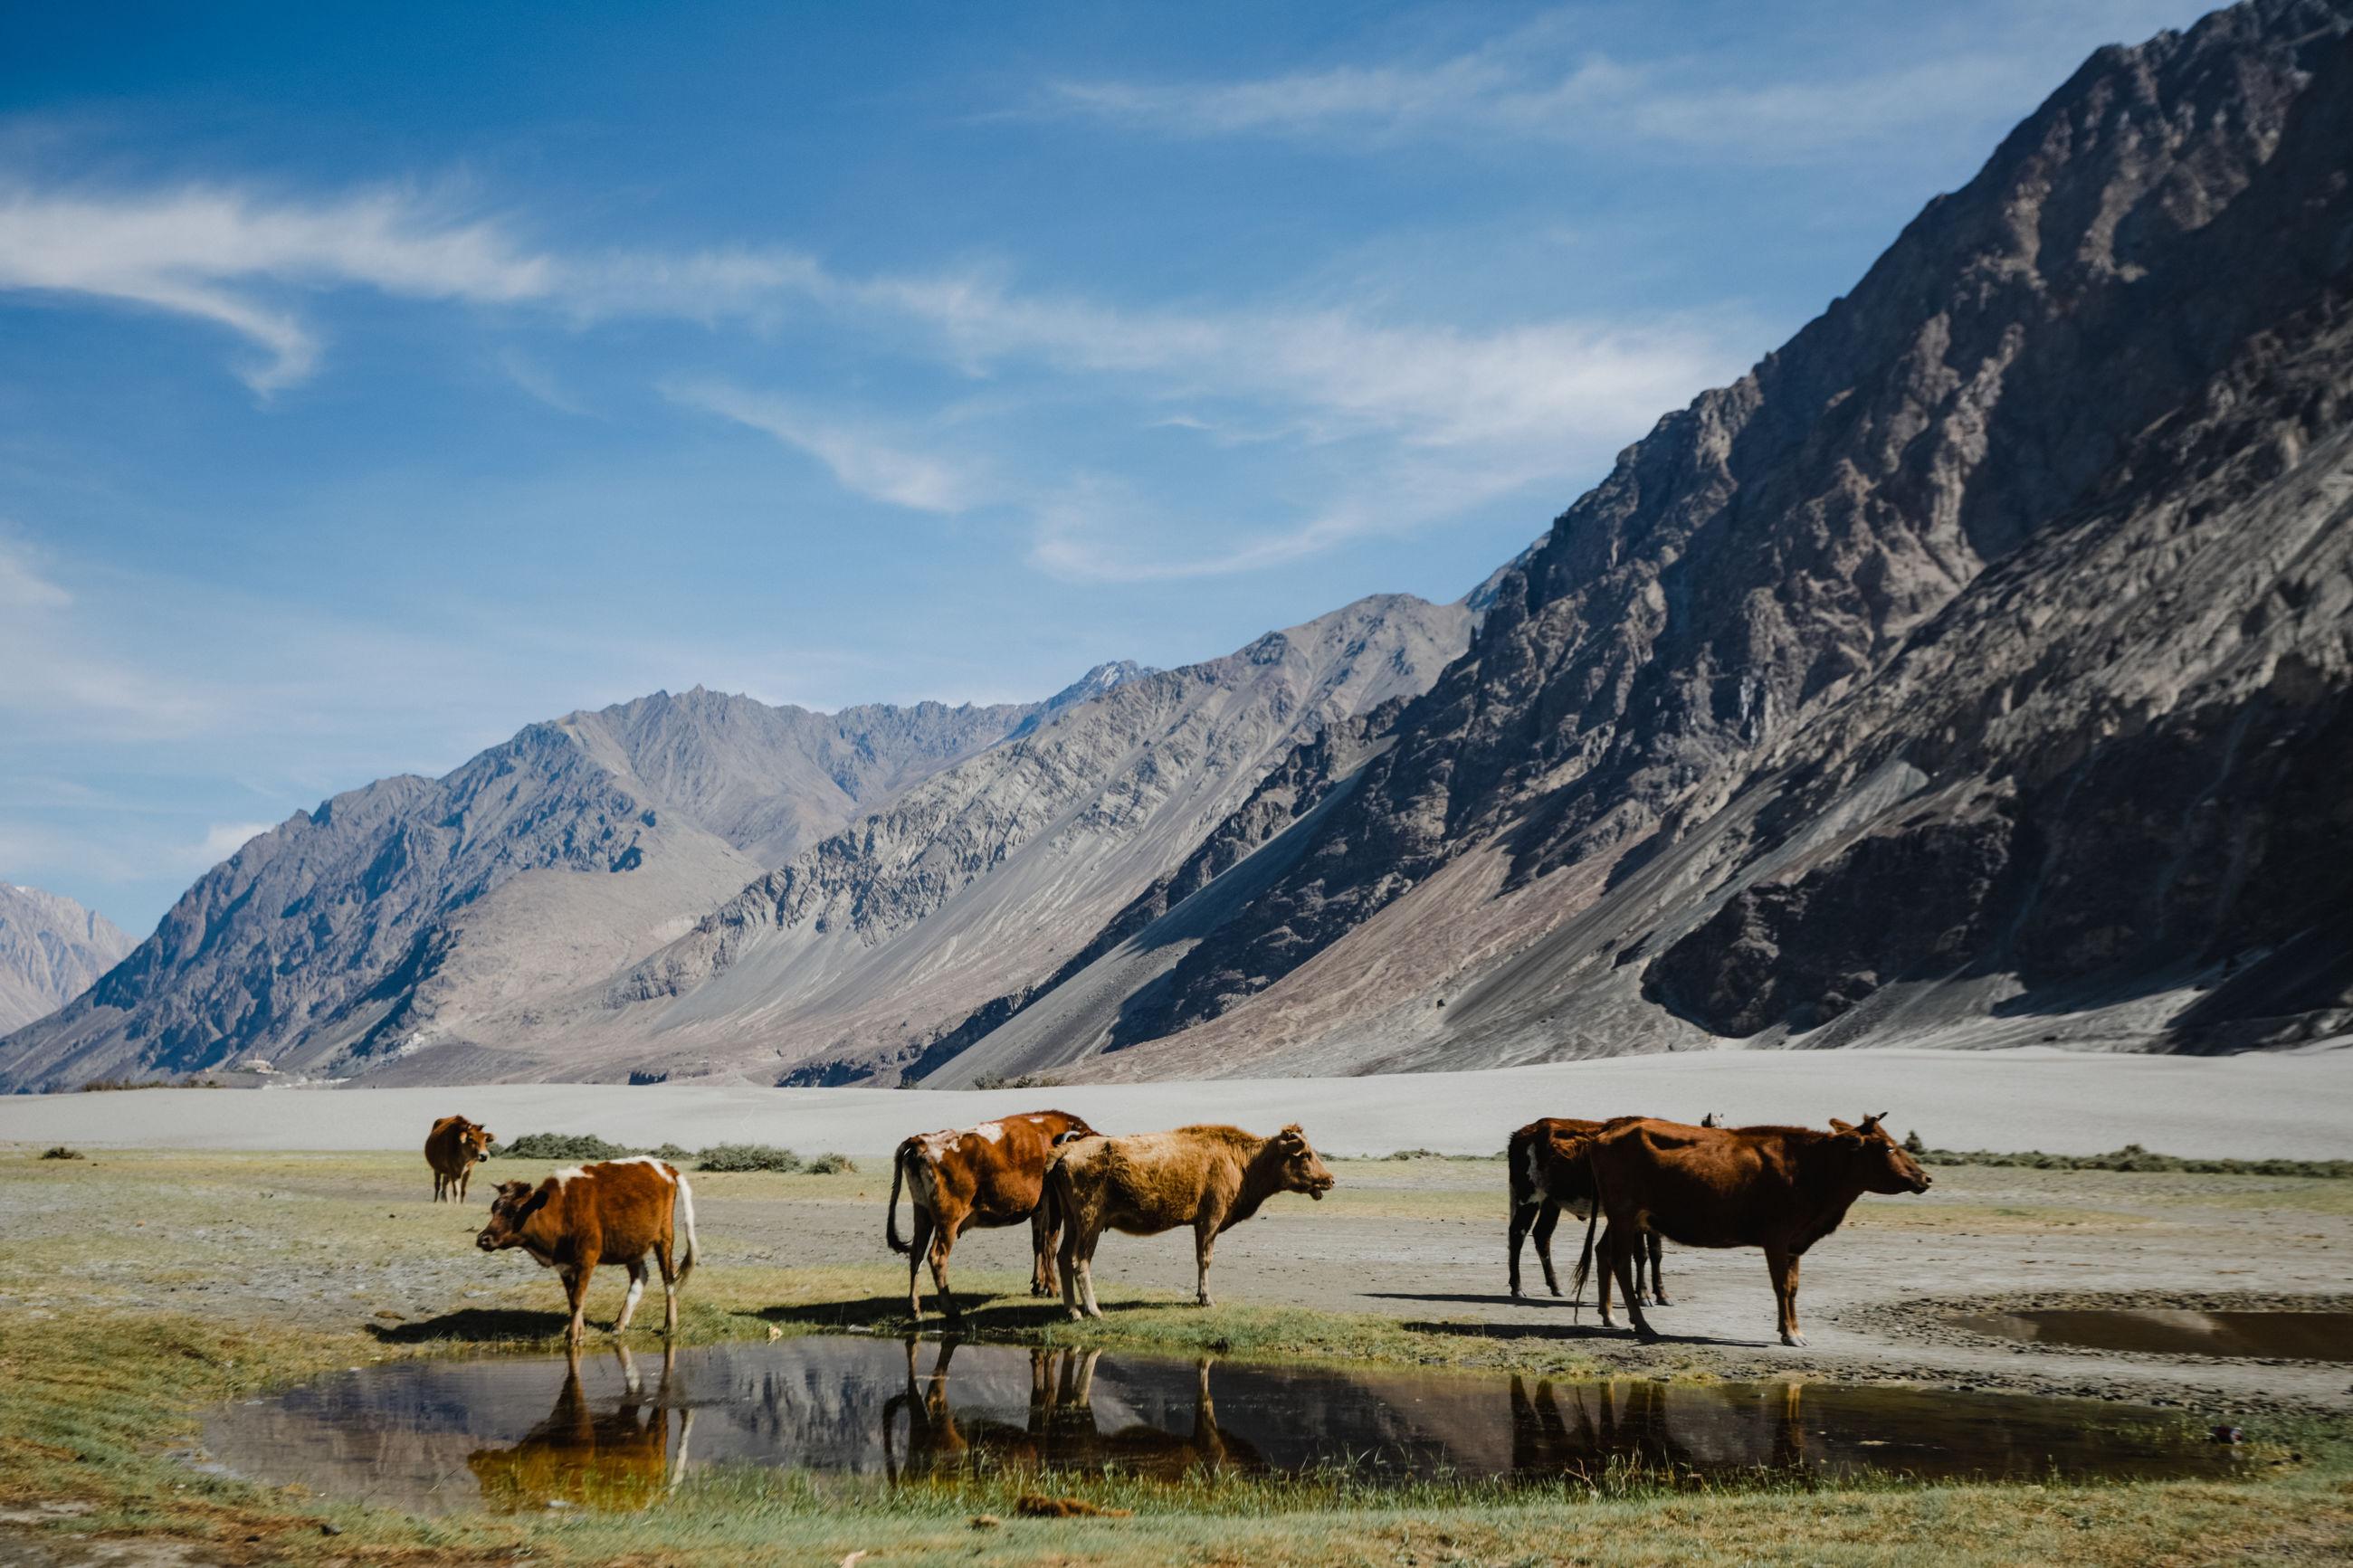 Cows on field against leh mountain range